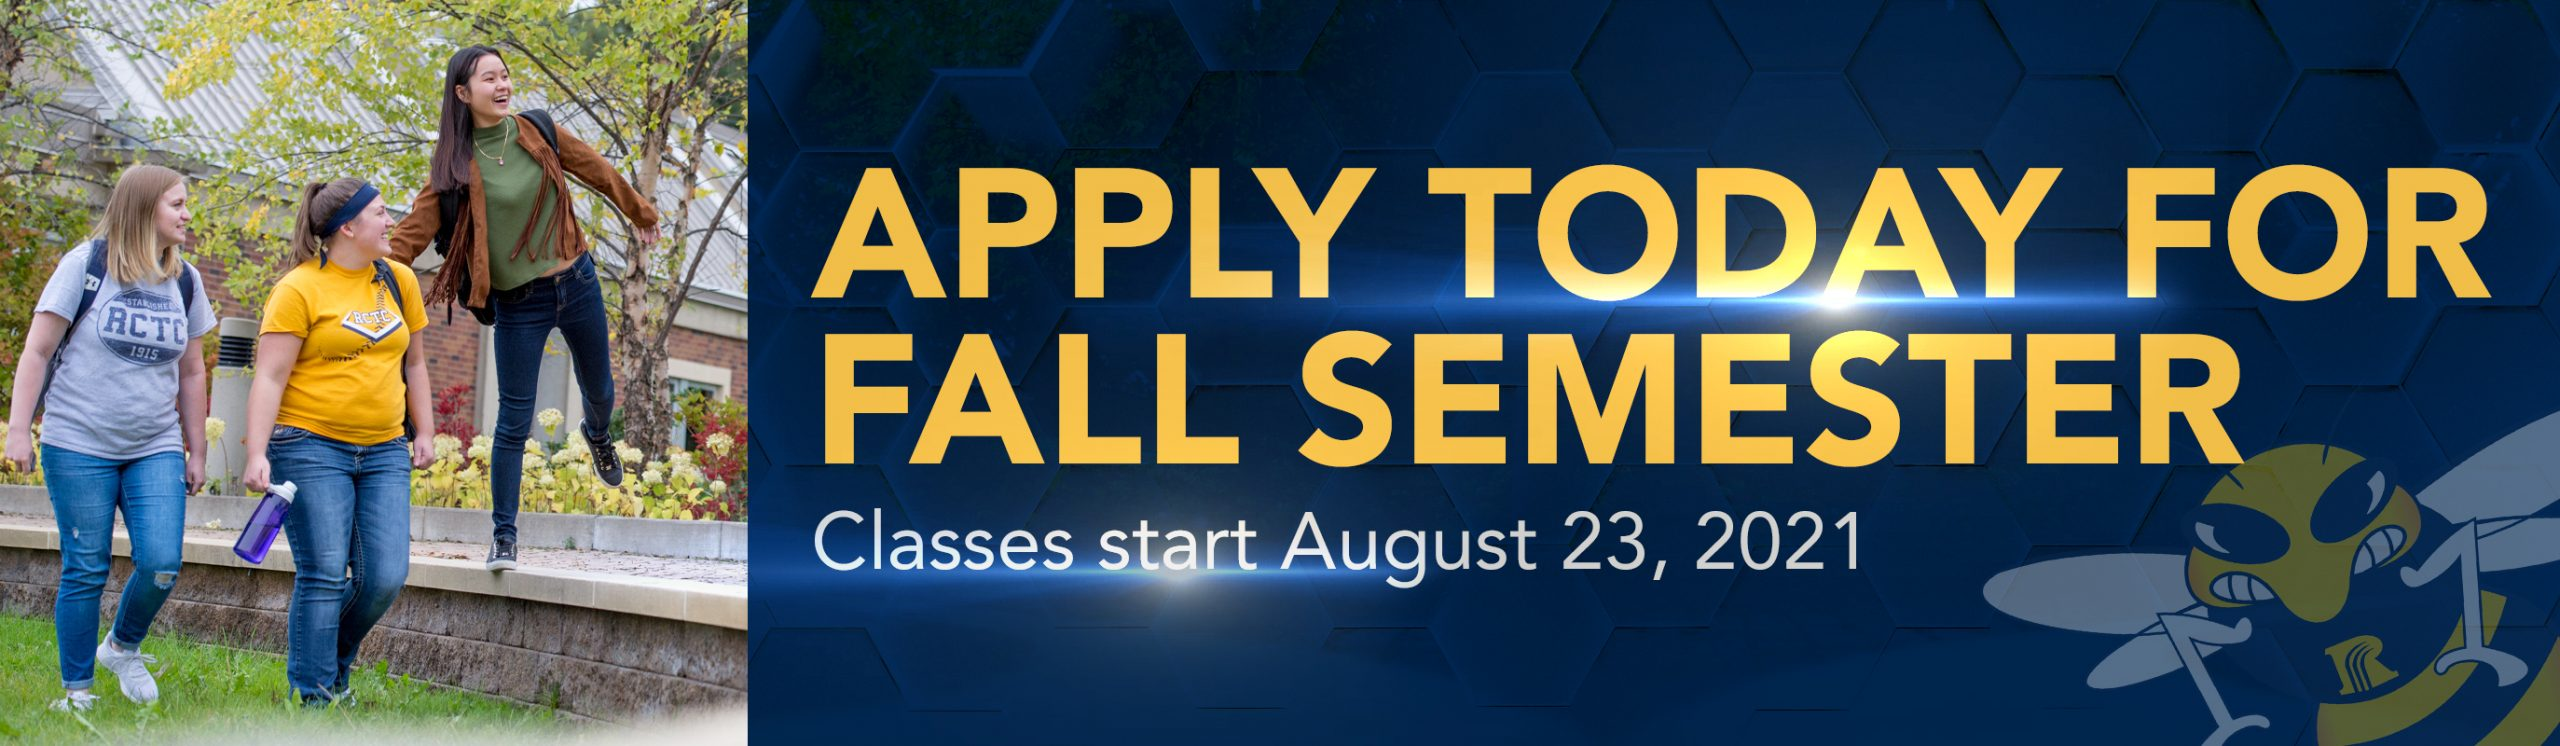 Fall Semester 21 Apply